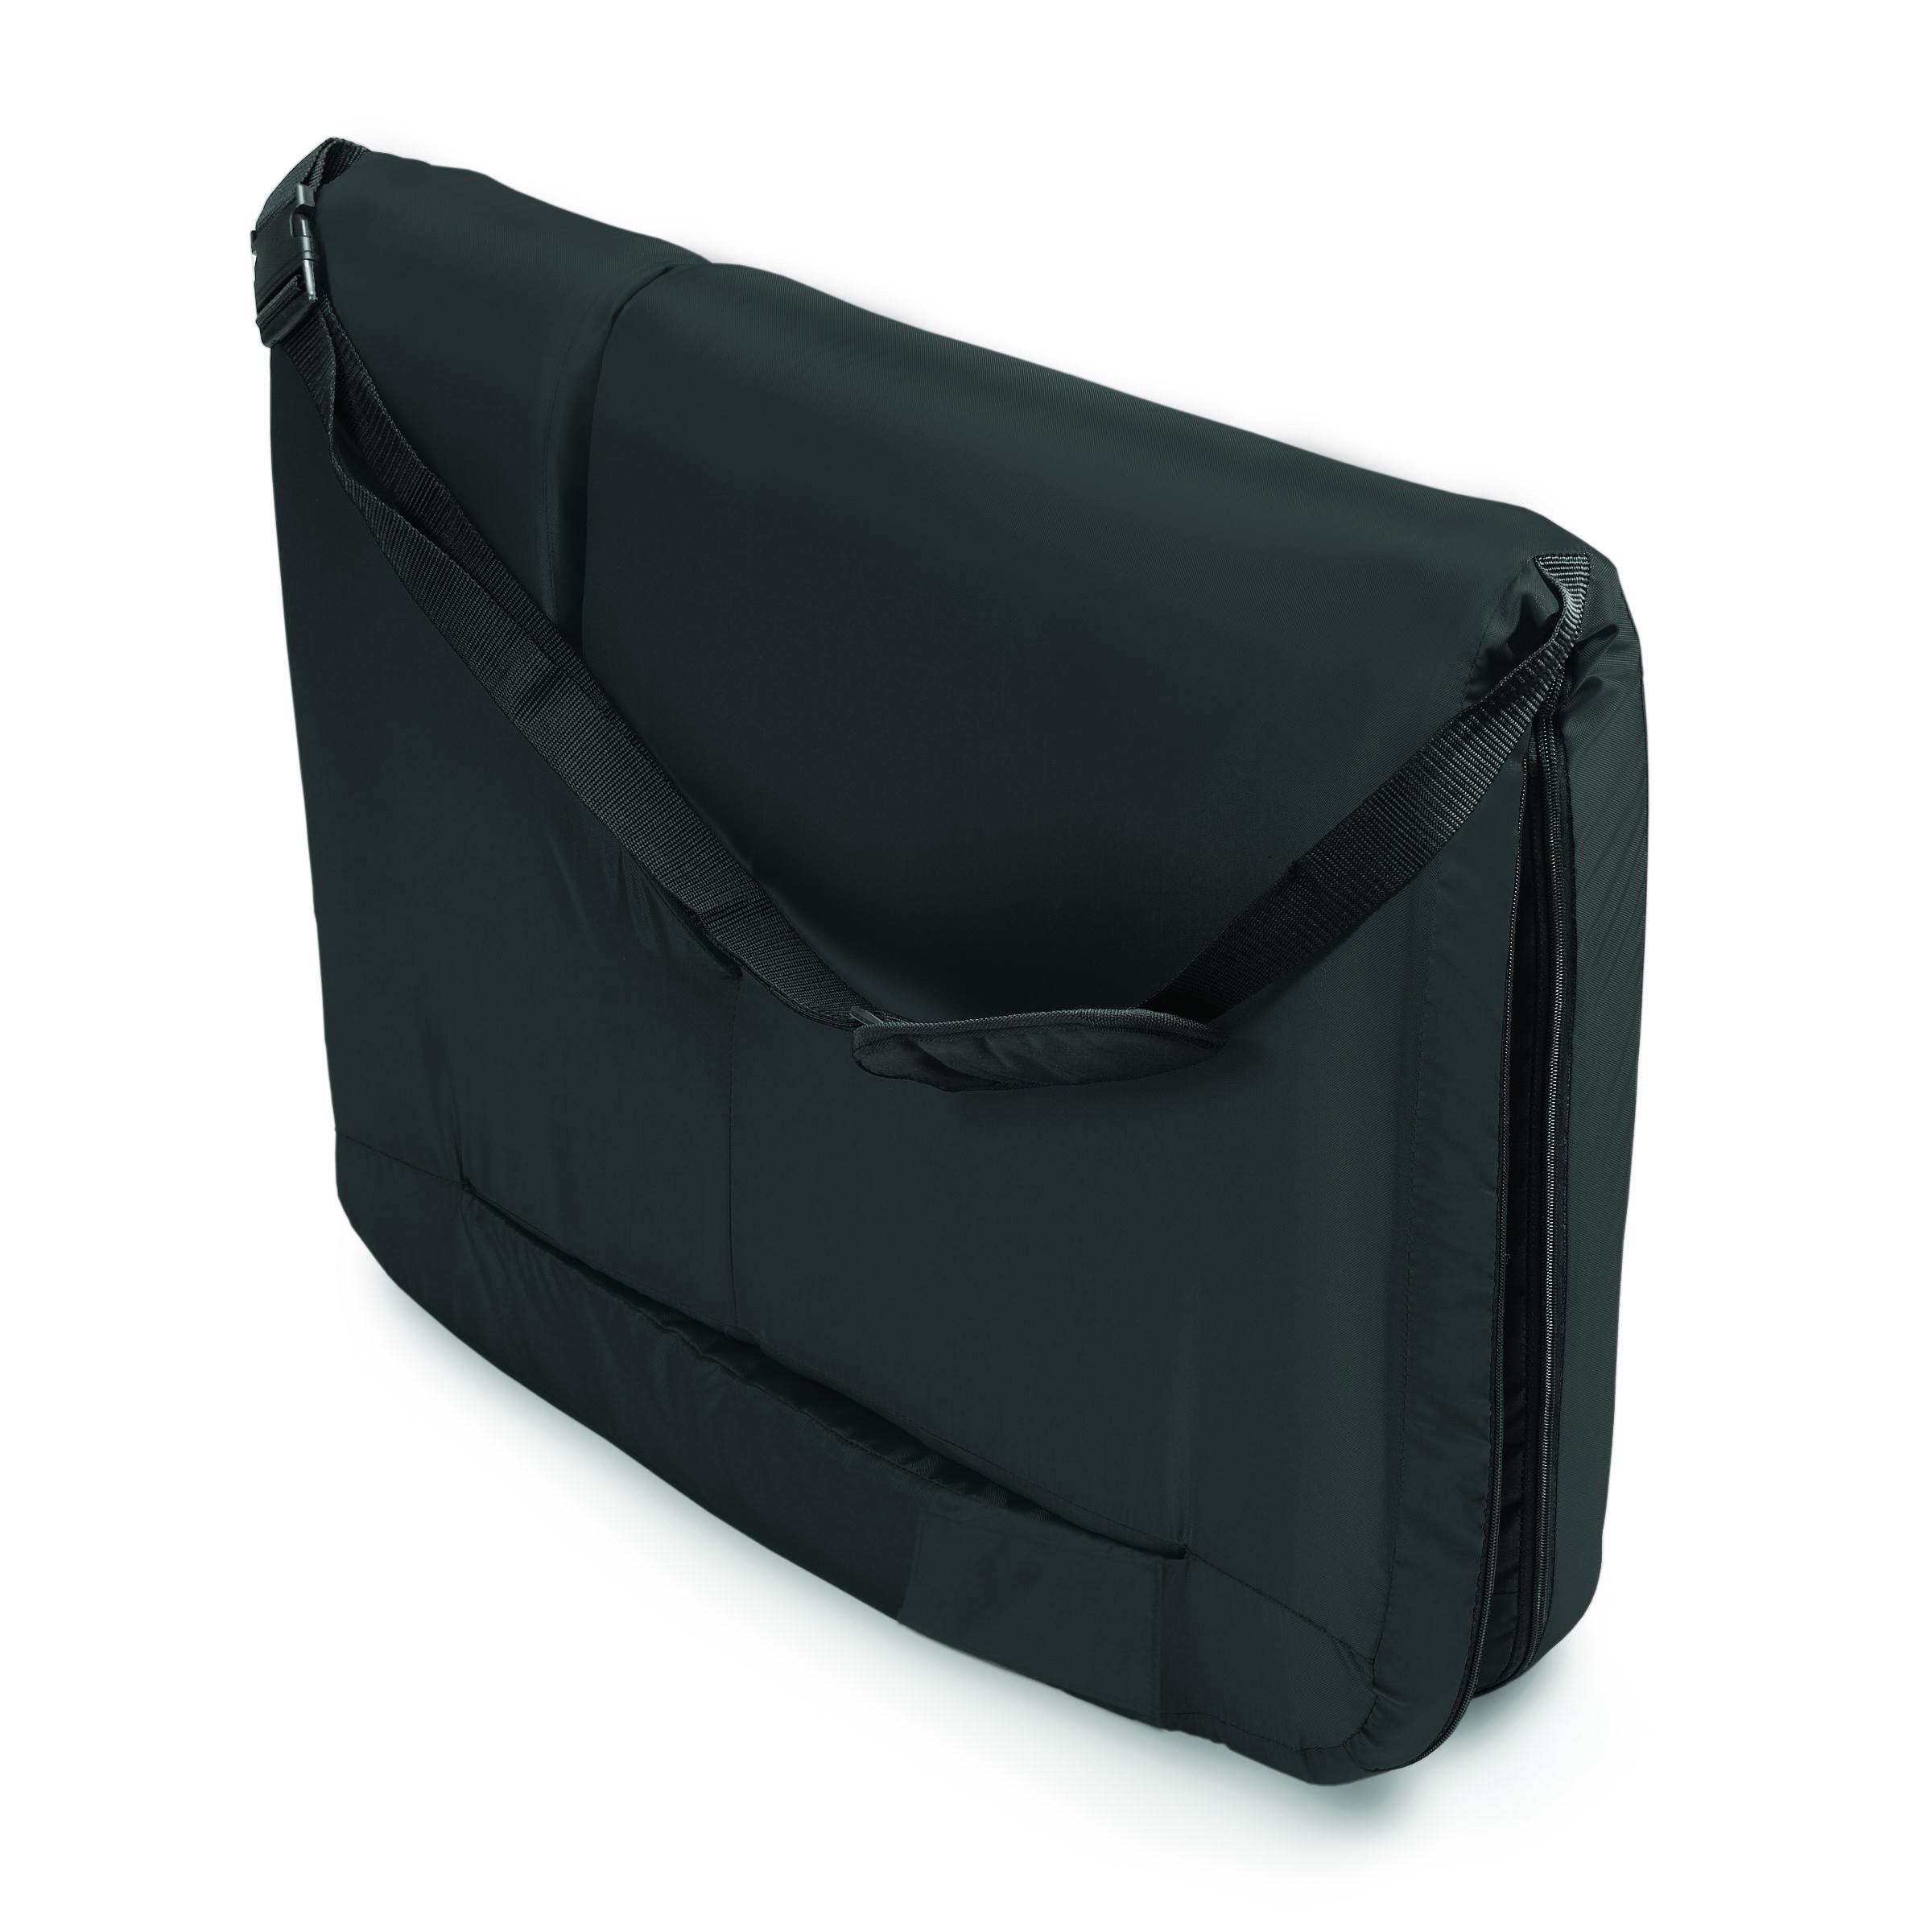 travel chair big bubba modern tan leather dining picnic time reflex portable reclining coach, black